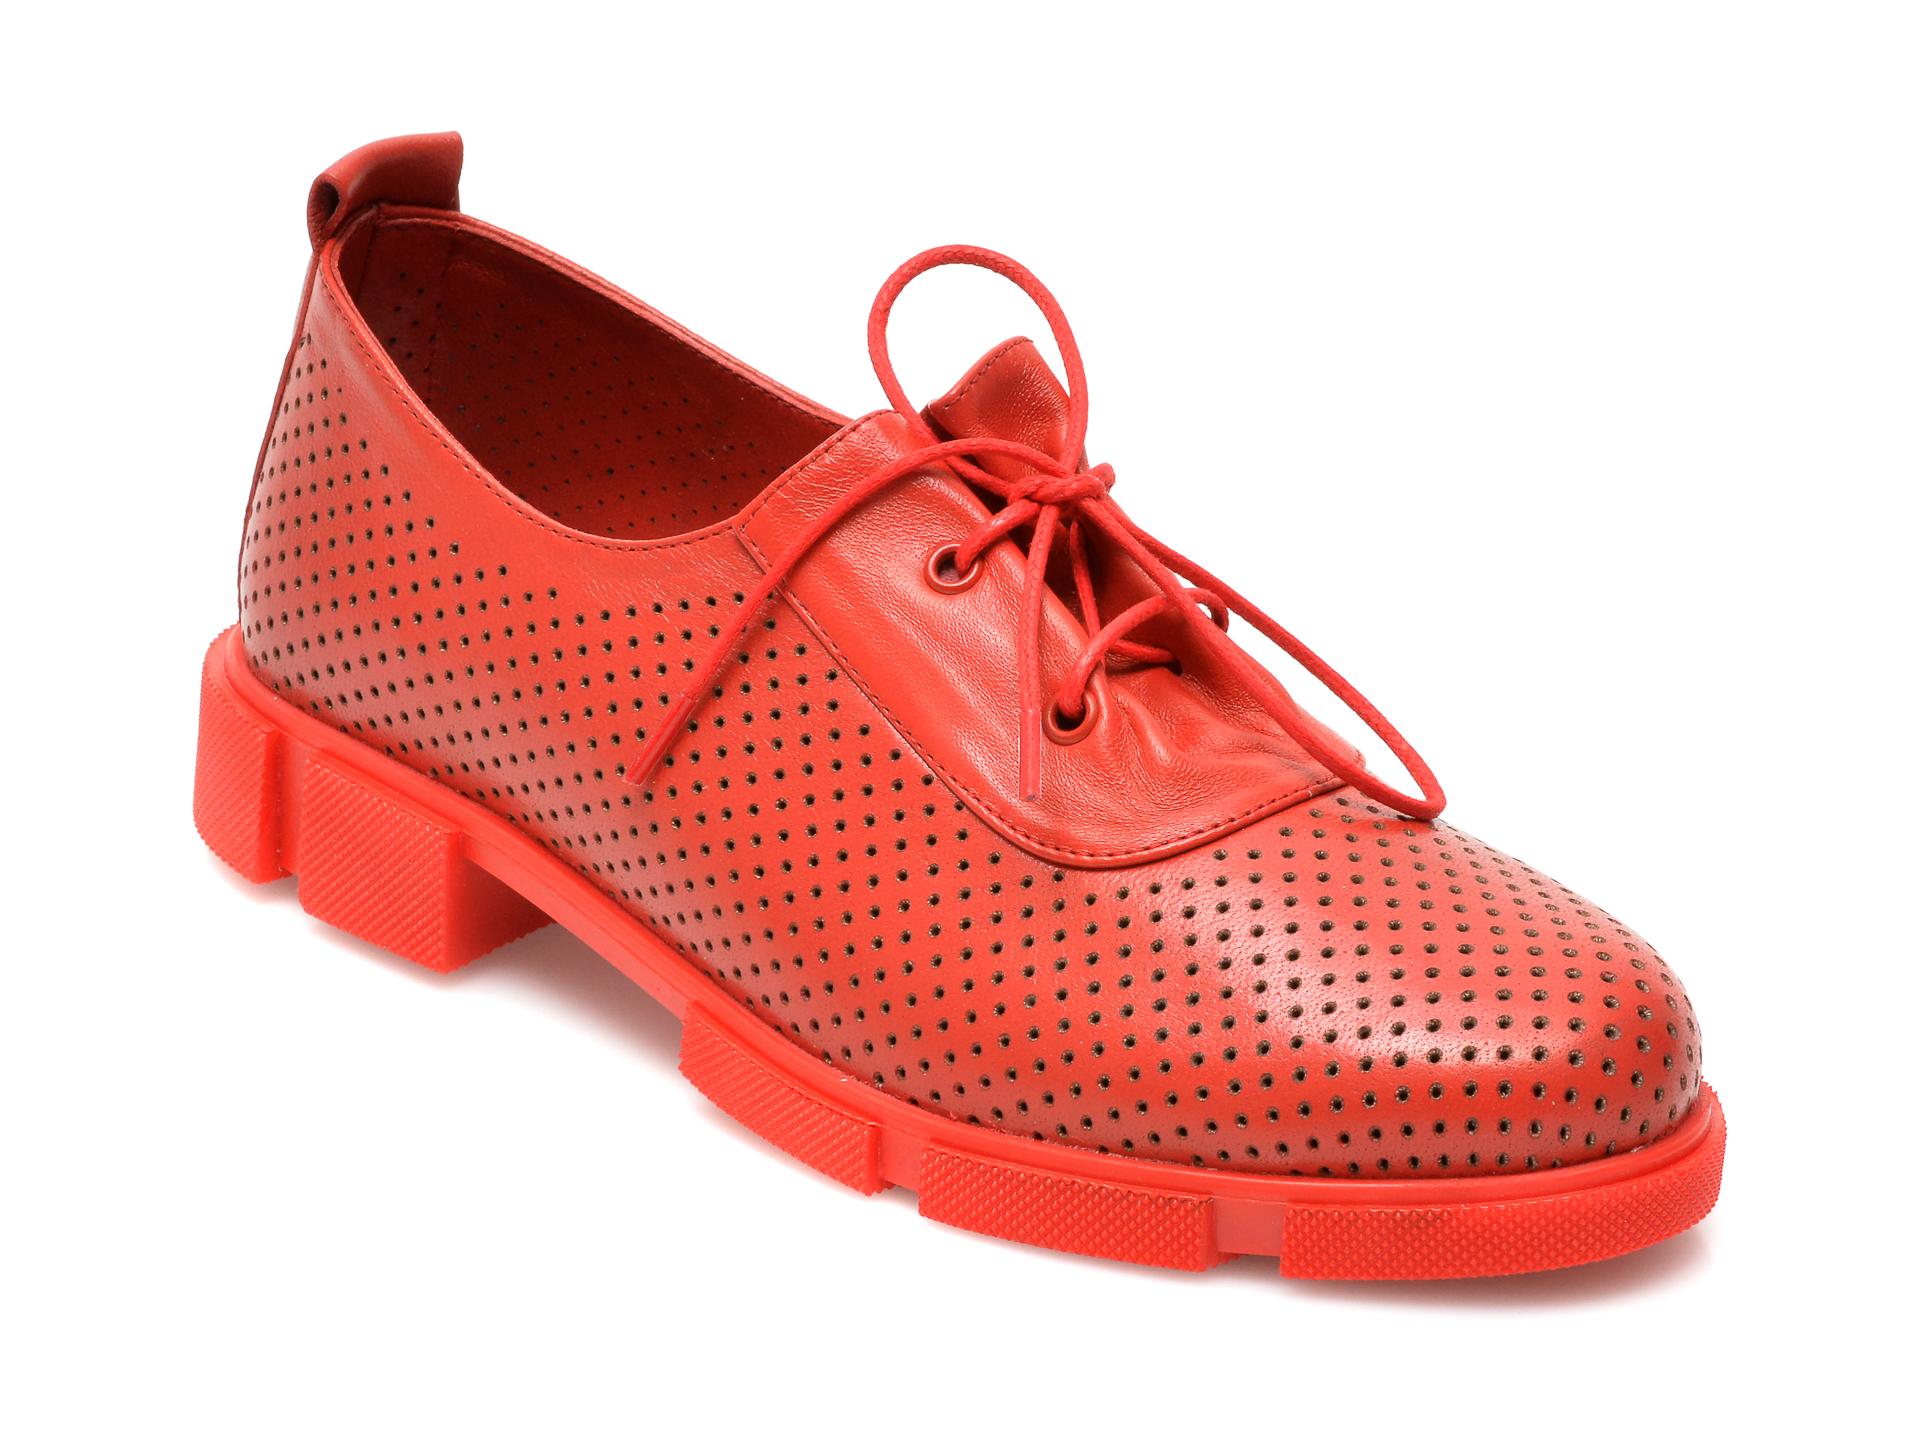 Pantofi MOLLY BESSA rosii, MN121, din piele naturala